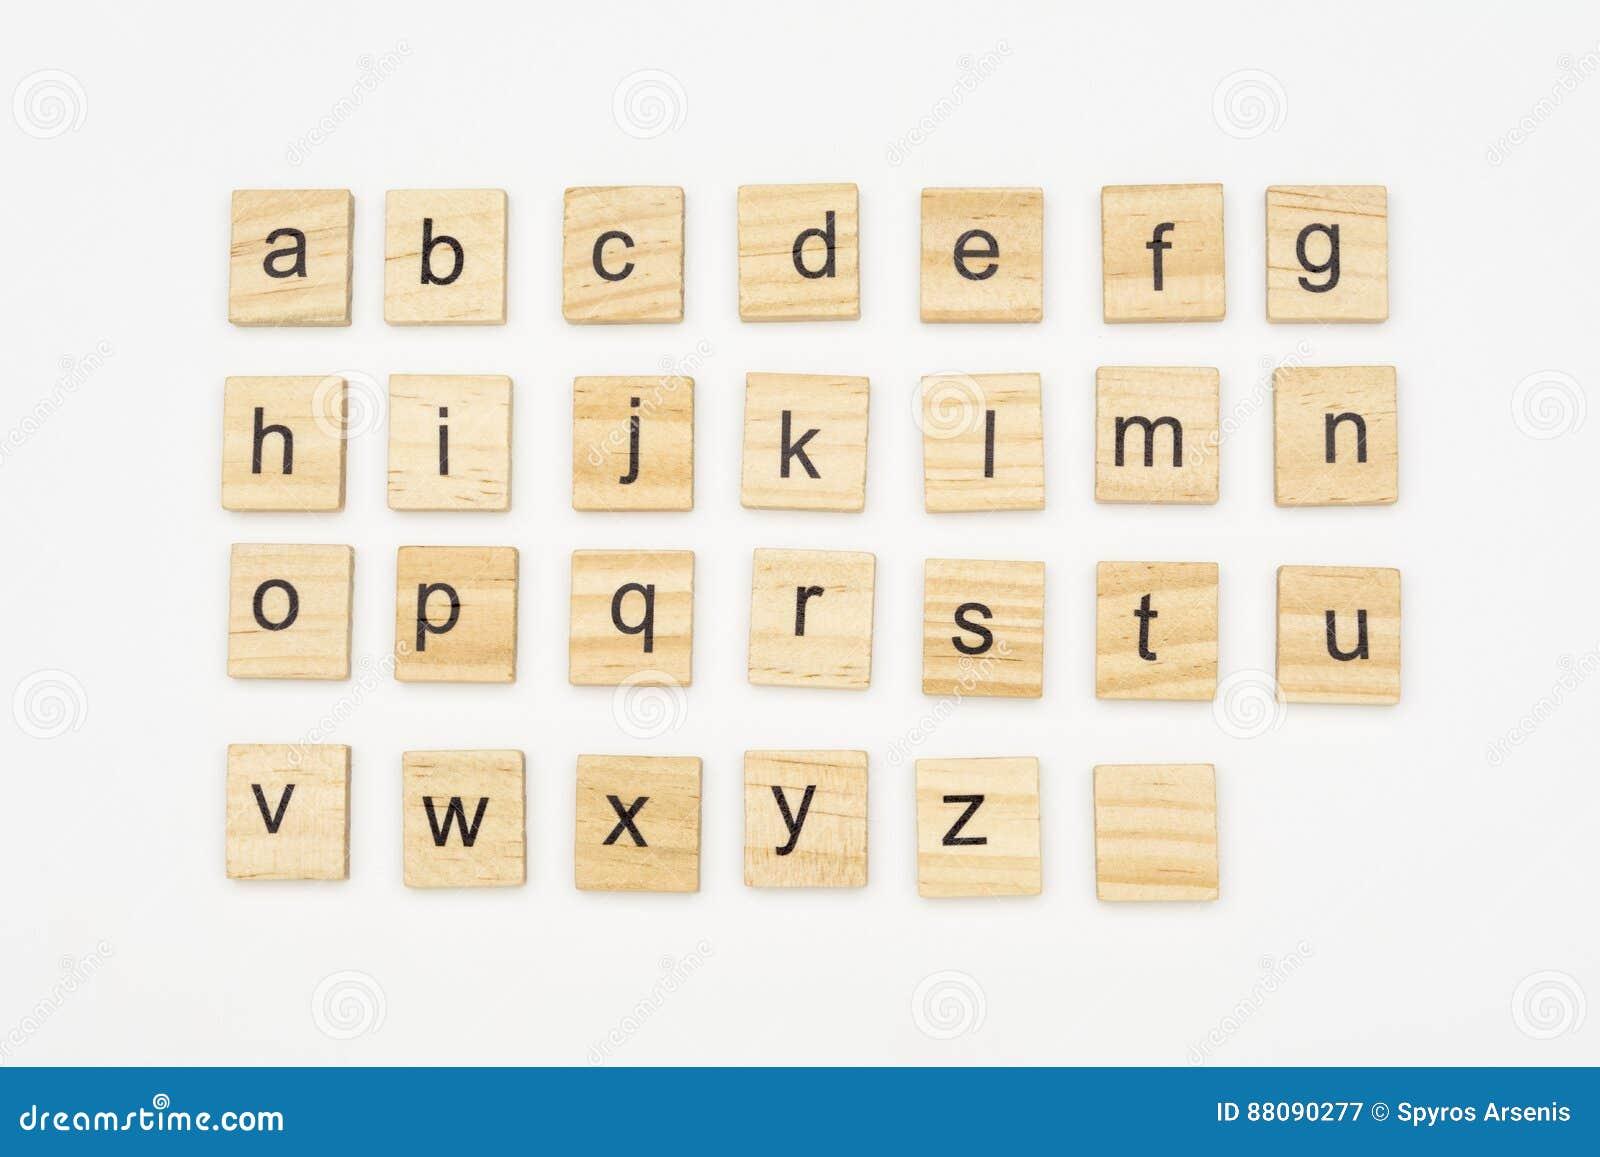 Lowercase alphabet letters on scrabble wooden blocks